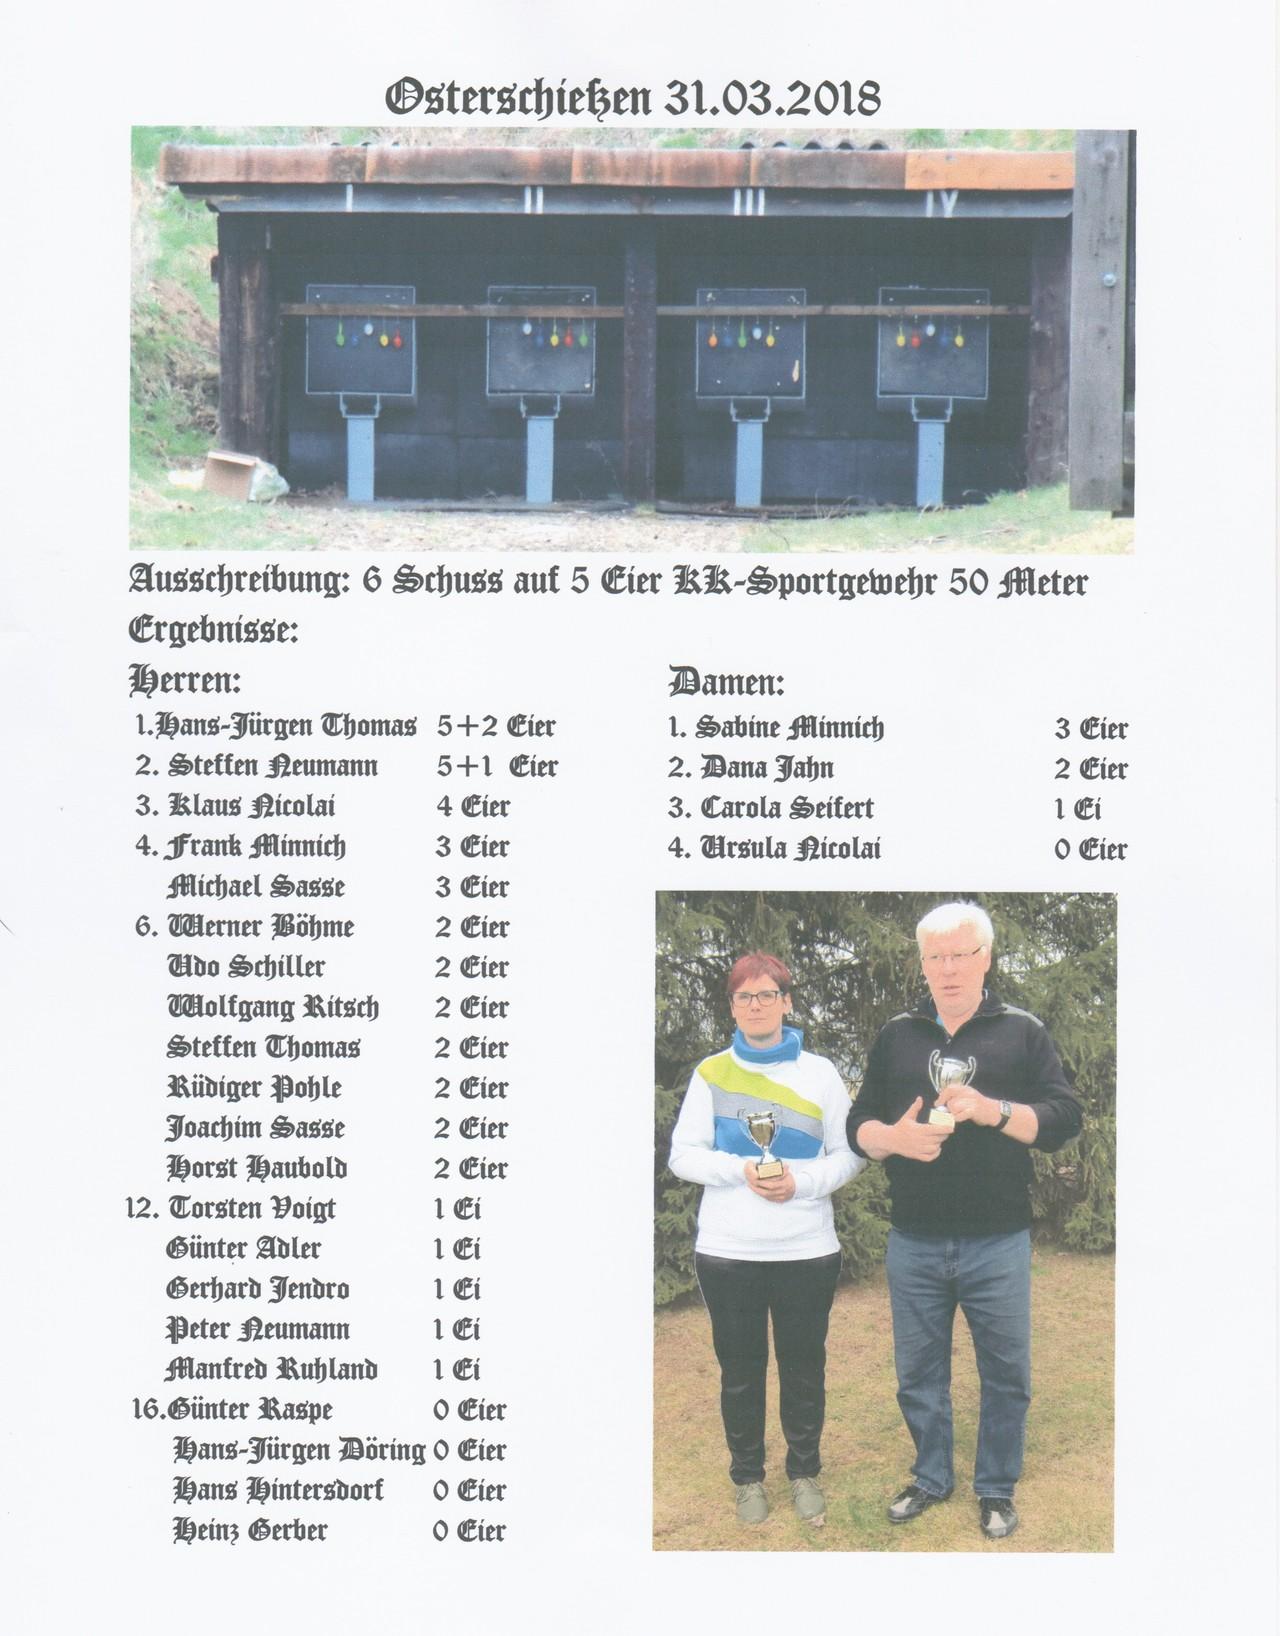 2018 07 Osterschiessen